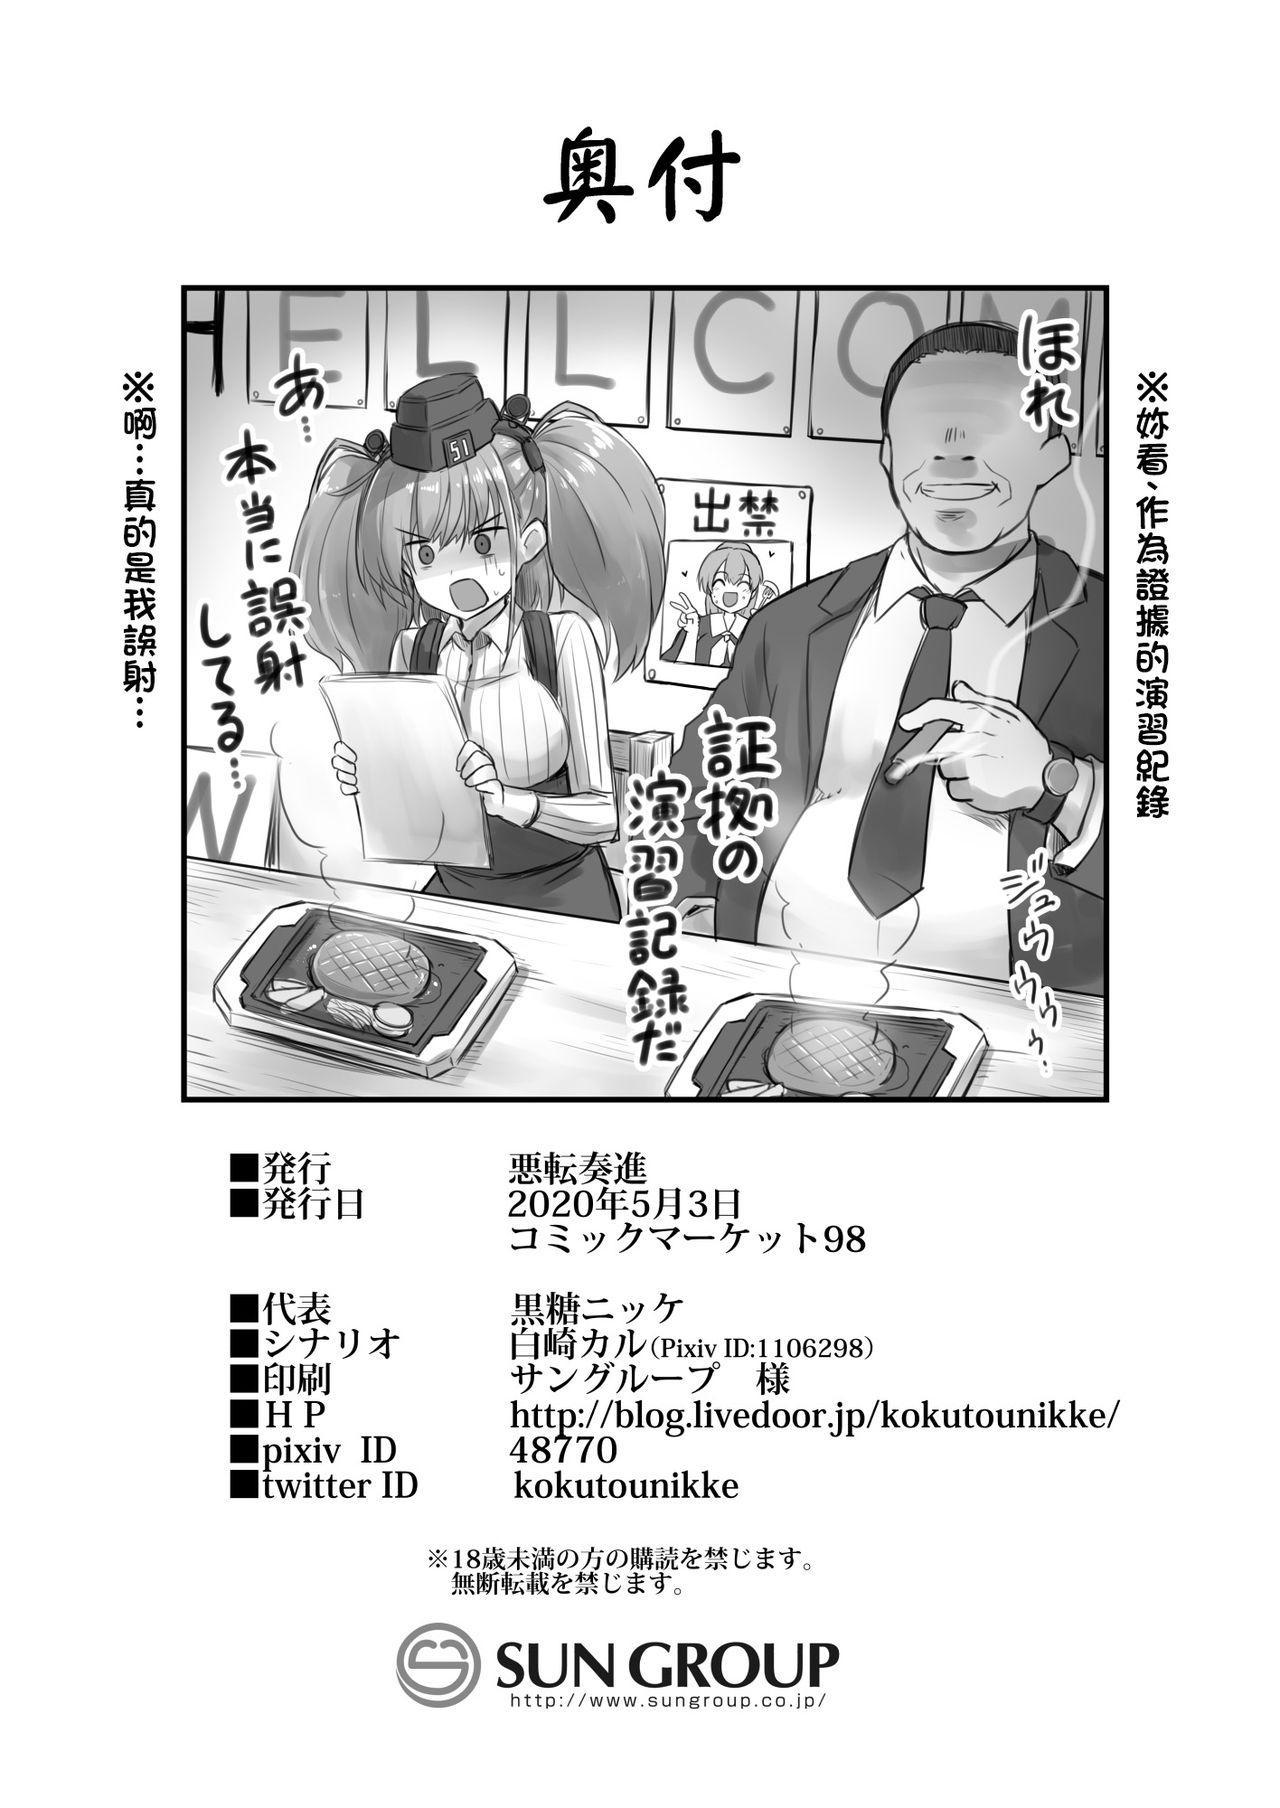 [Akuten Soushin (Kokutou Nikke)] Kanmusu Chakunin Zenya - Atlanta Mune-Sei Houshi Katsudou (Kantai Collection -KanColle-) [Chinese] [therethere個人翻譯&嵌字] [Digital] 30